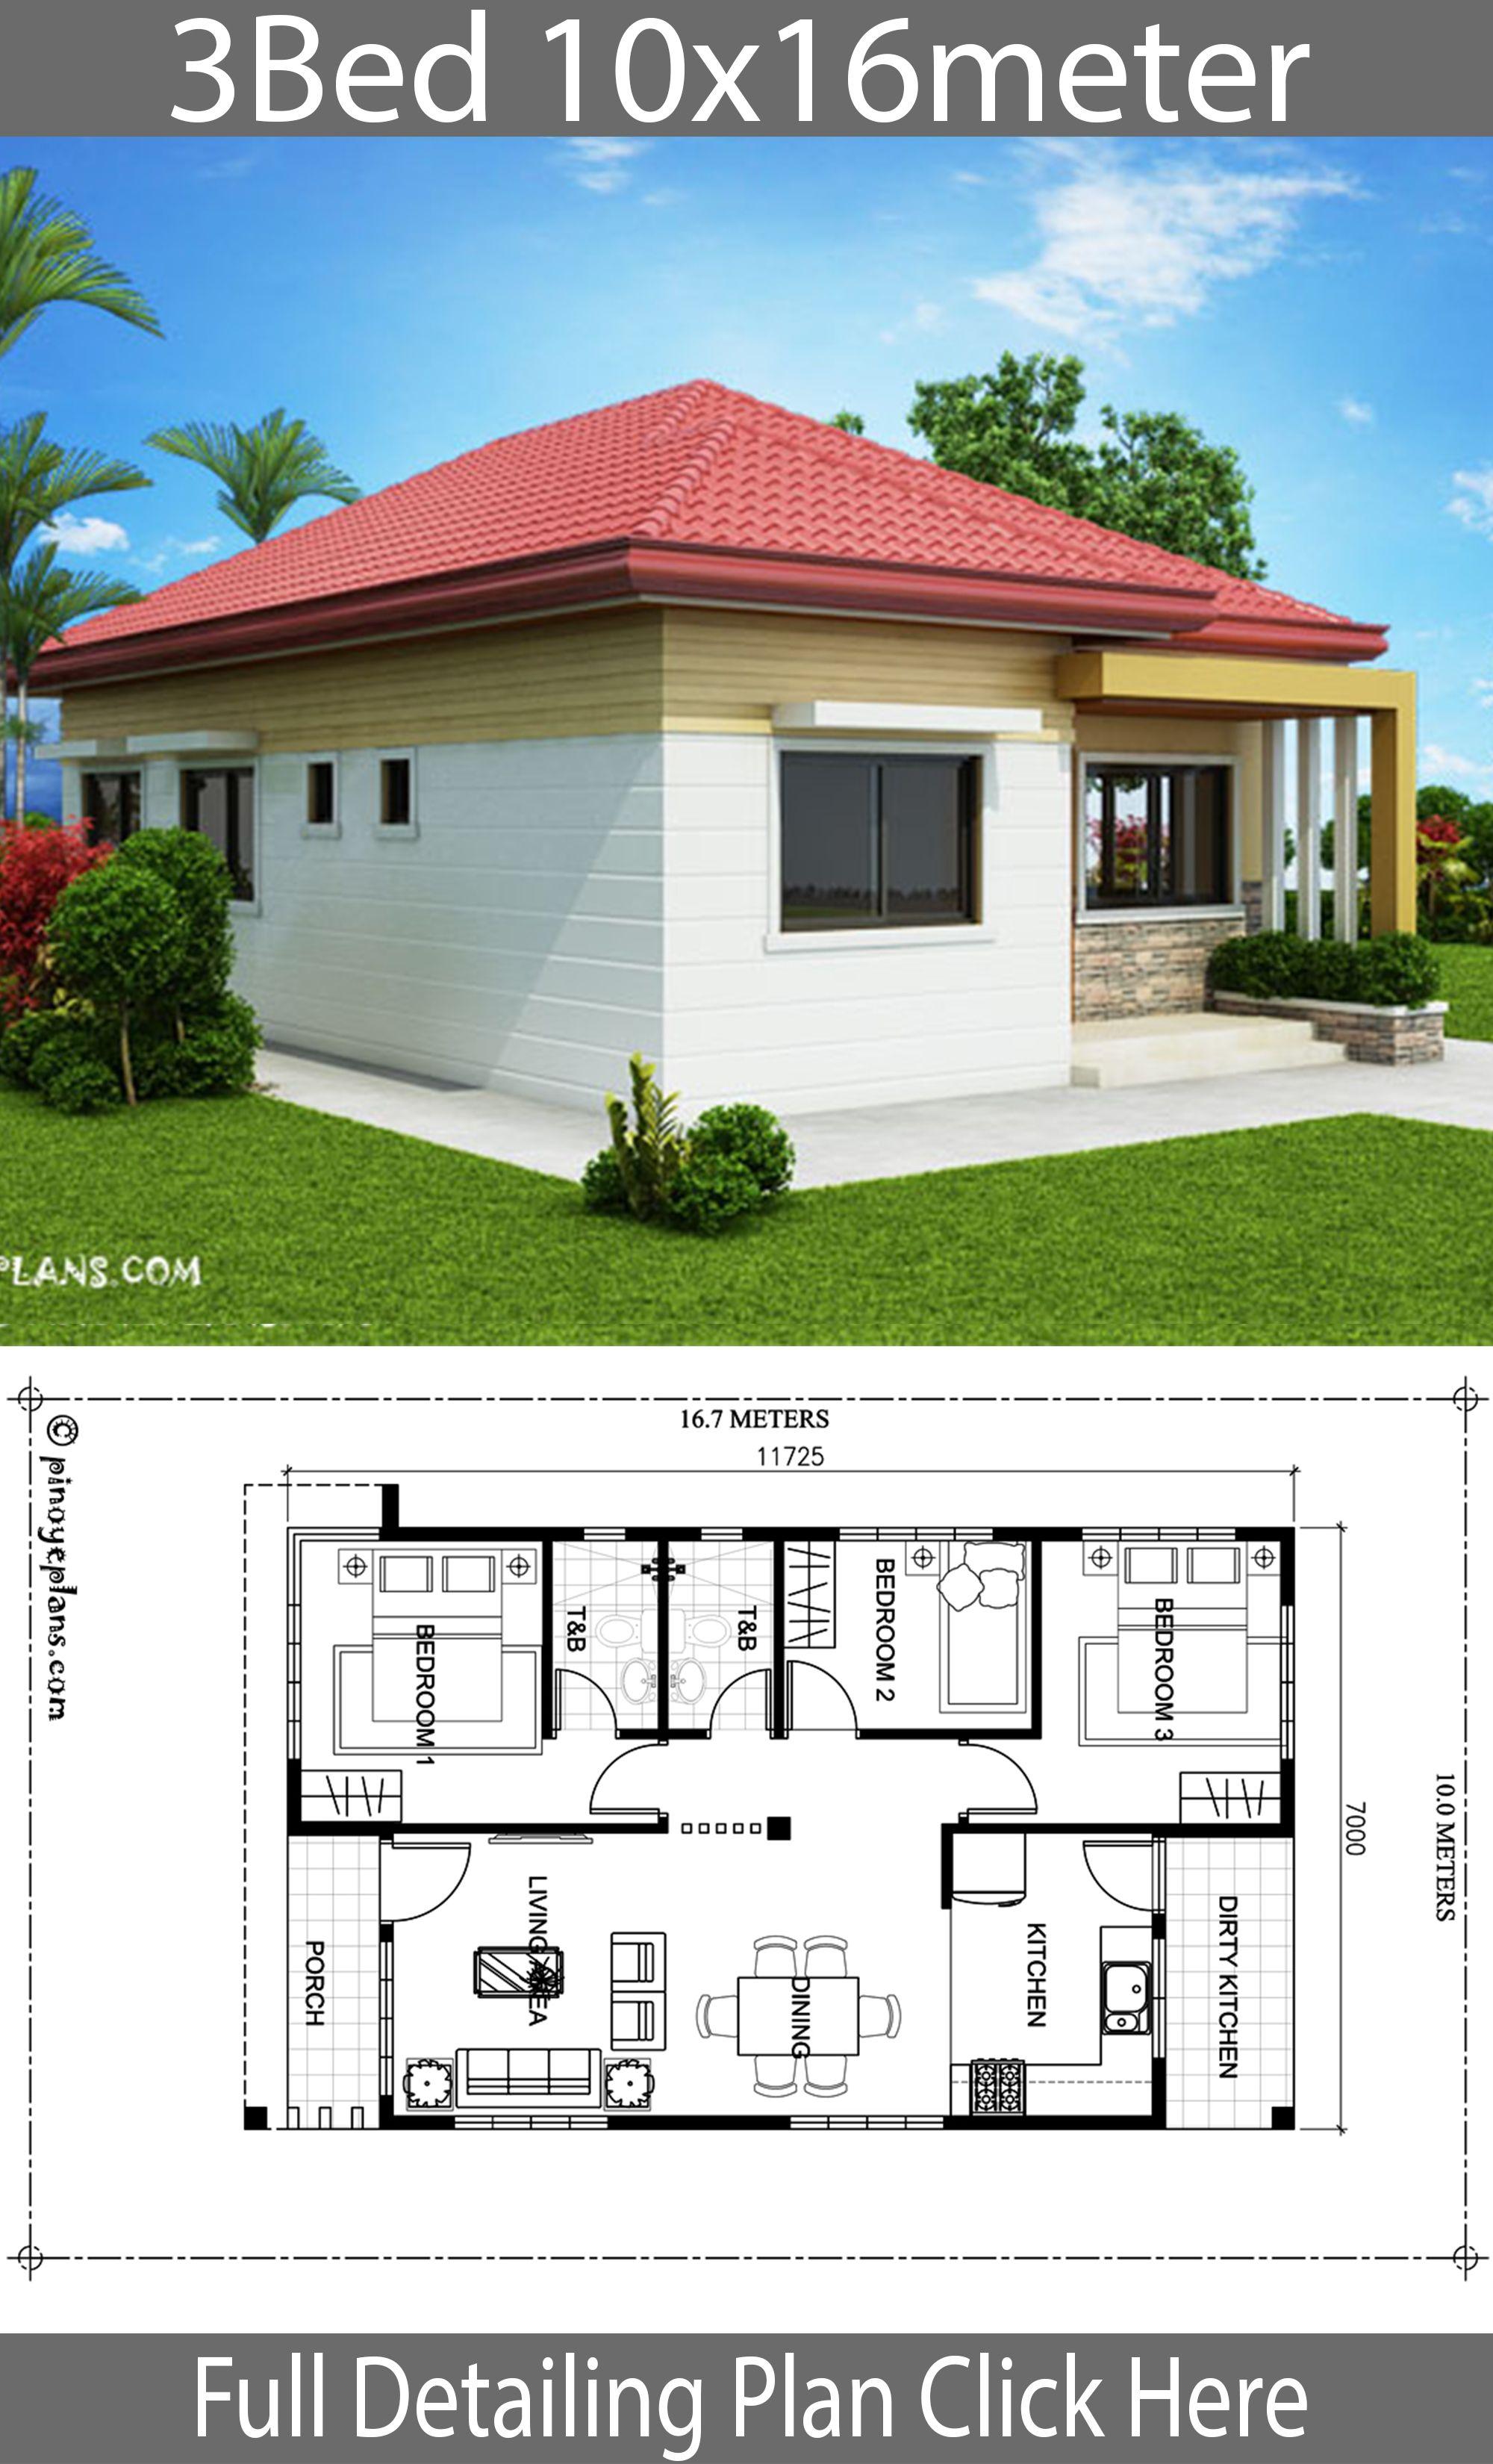 Pin By Abraham Abayateye On House Plans Idea Bungalow Style House Plans Affordable House Plans Cottage Style House Plans